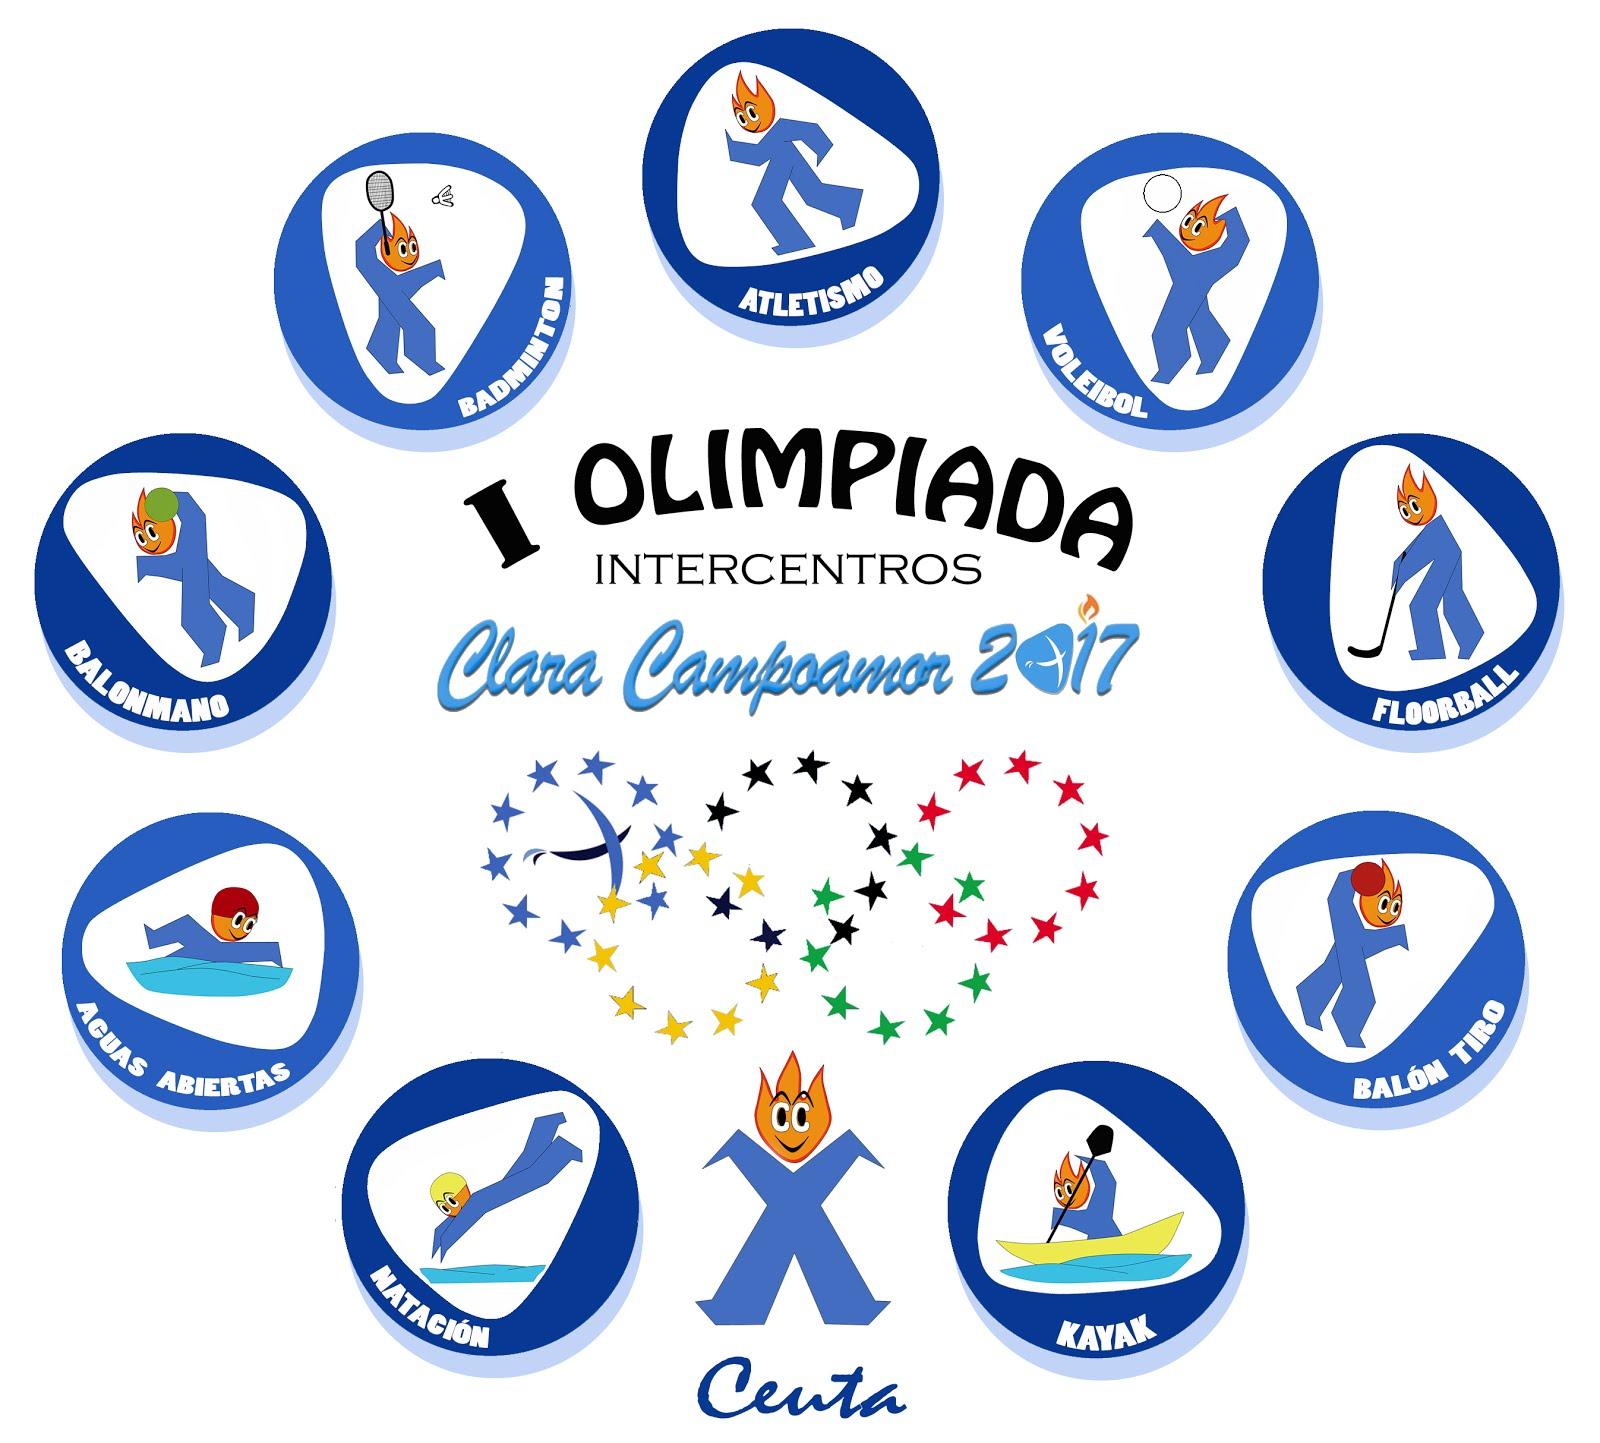 I Olimpiada Intercentros